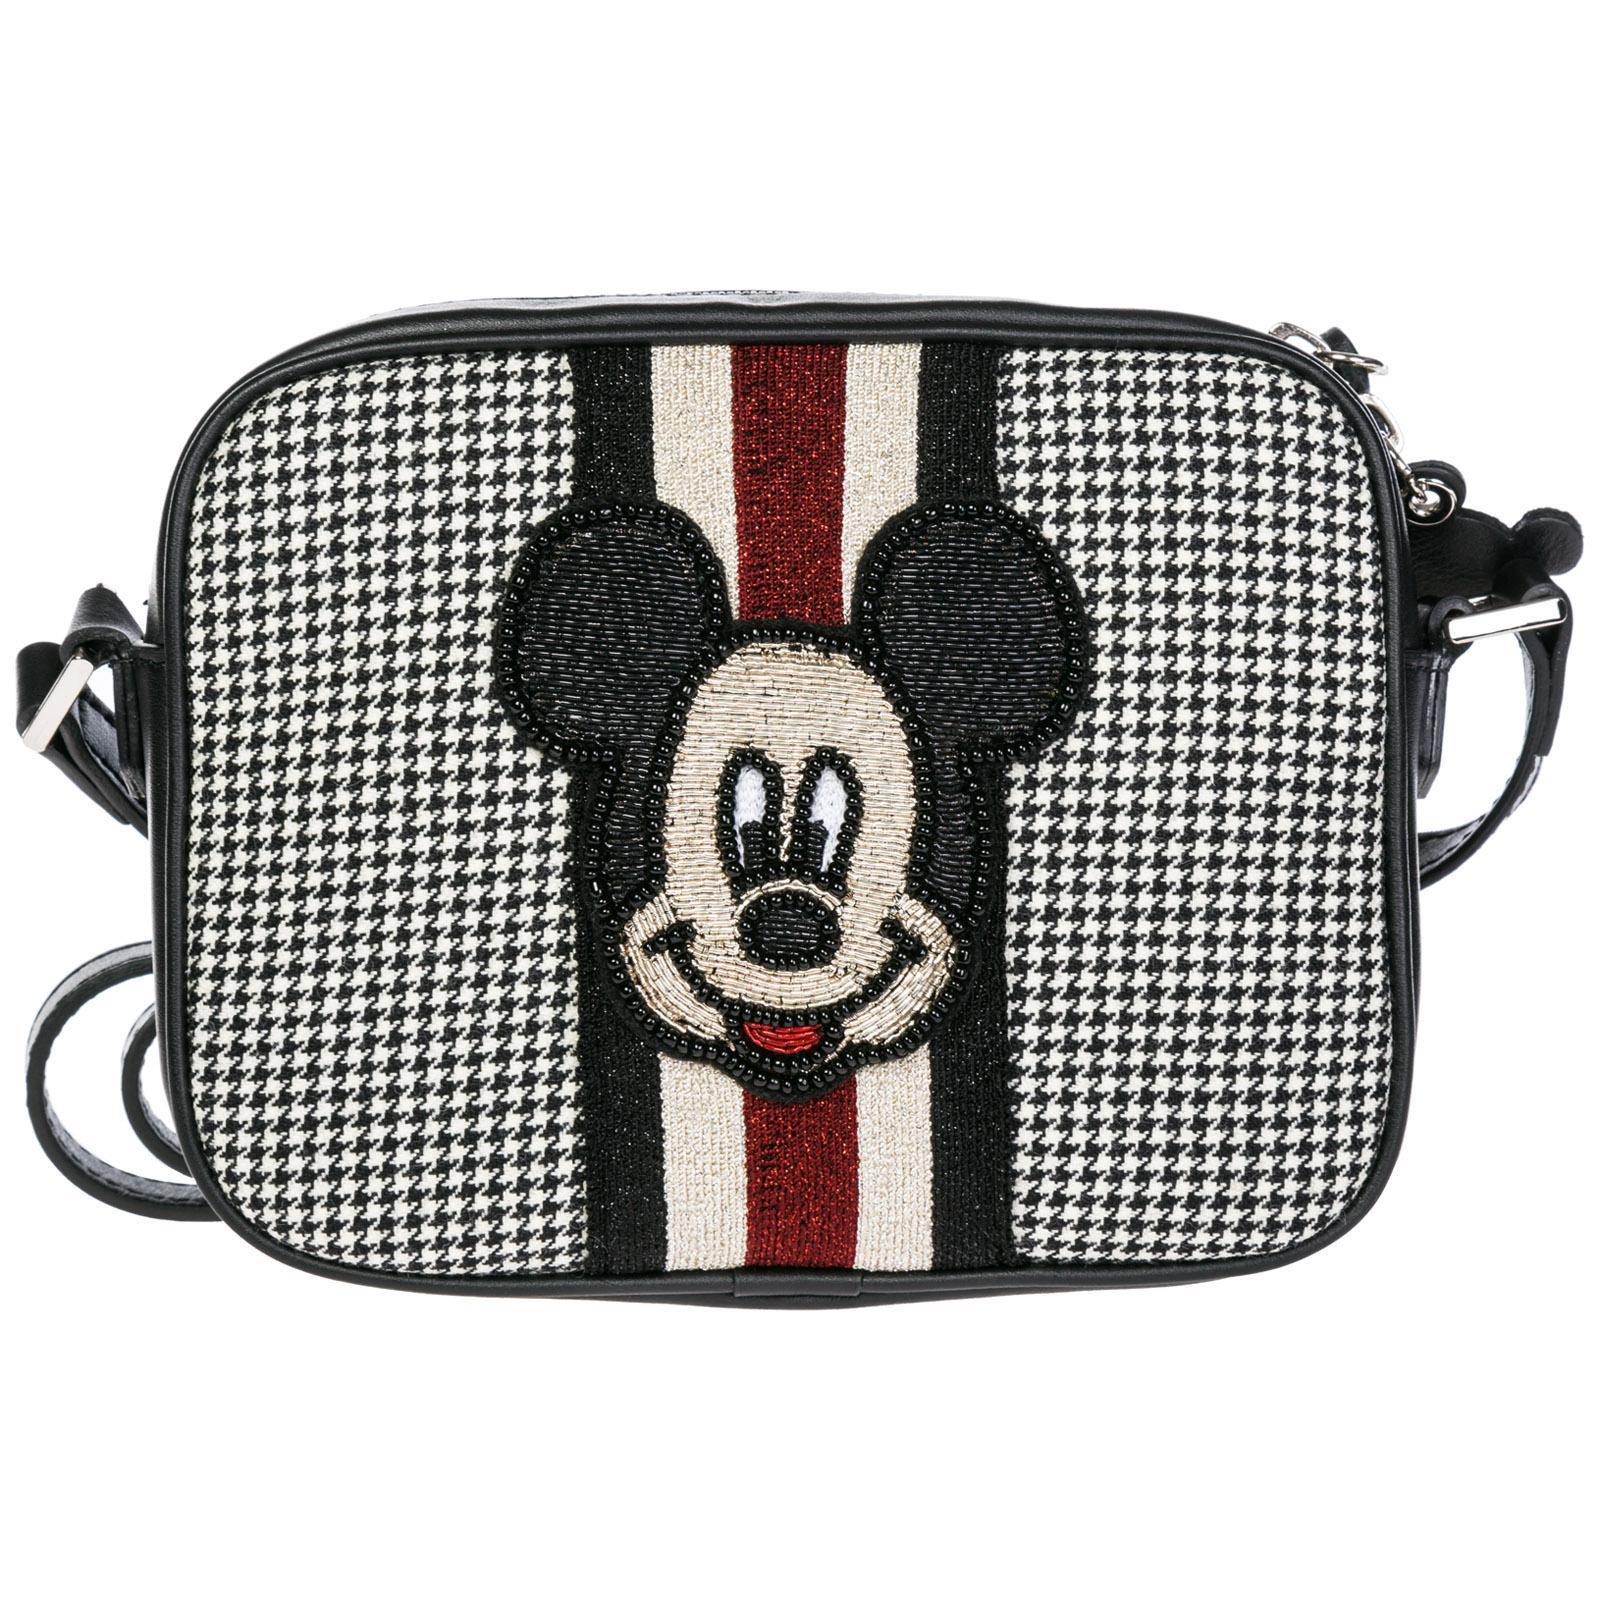 9a9f9350e12 MOA. Women's Black Leather Cross-body Messenger Shoulder Bag Disney Mickey  Mouse